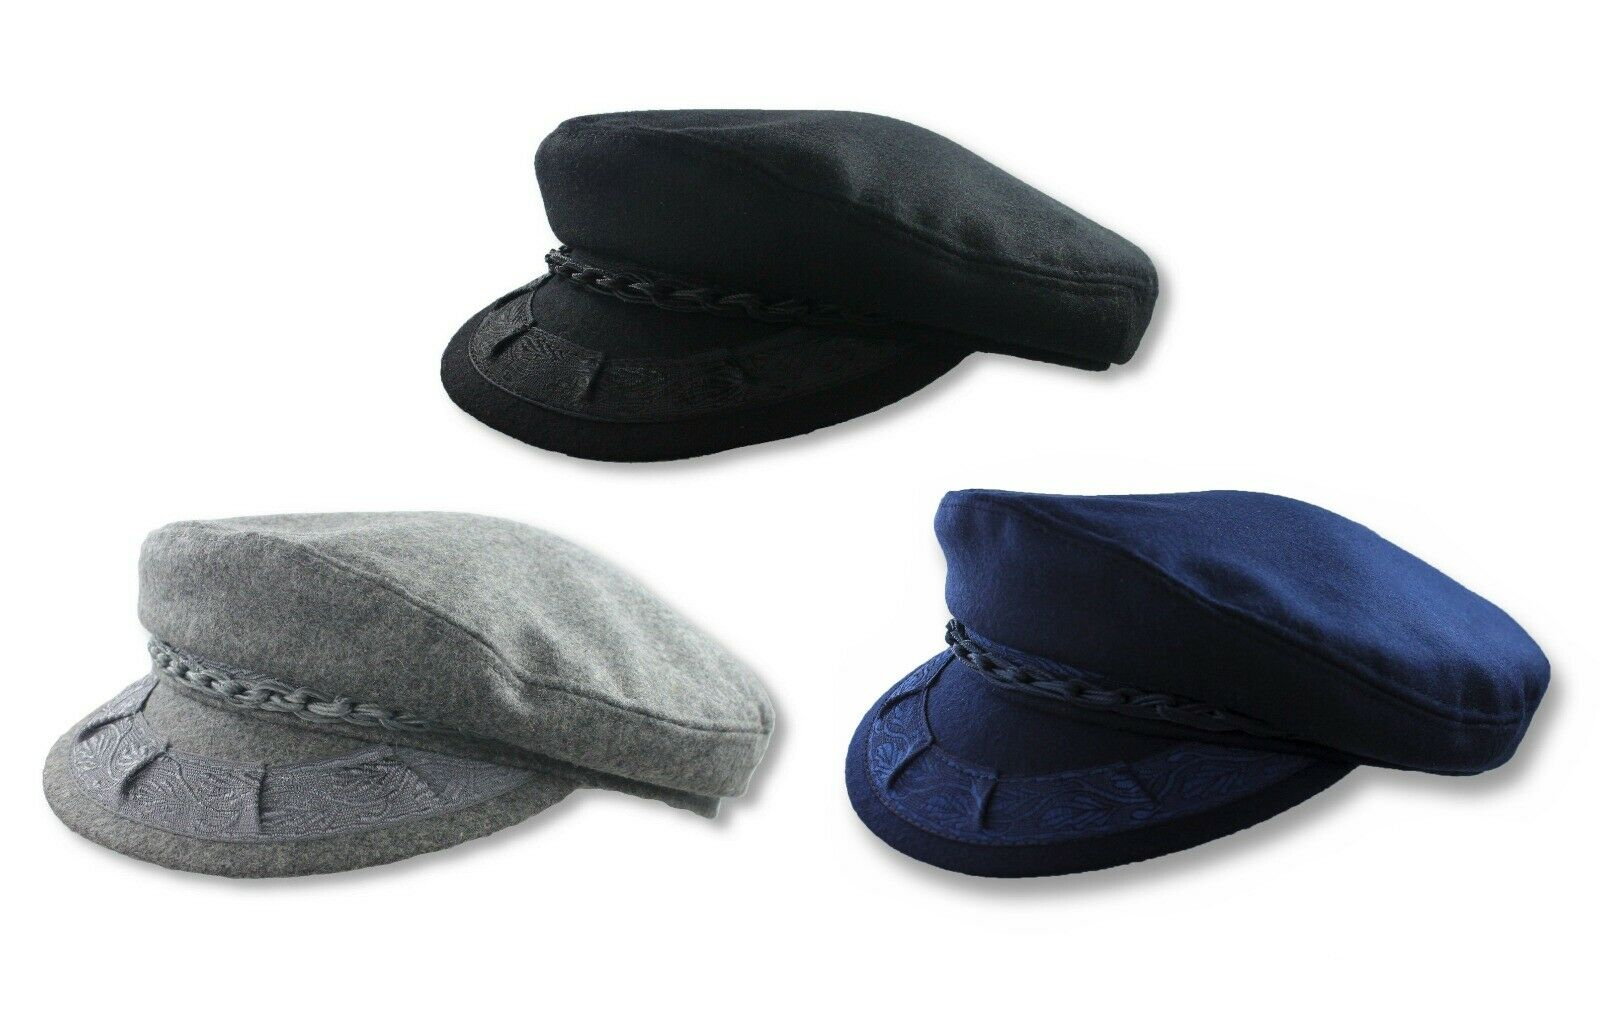 gripgrab aviator windproof skull cap windster black Size Small